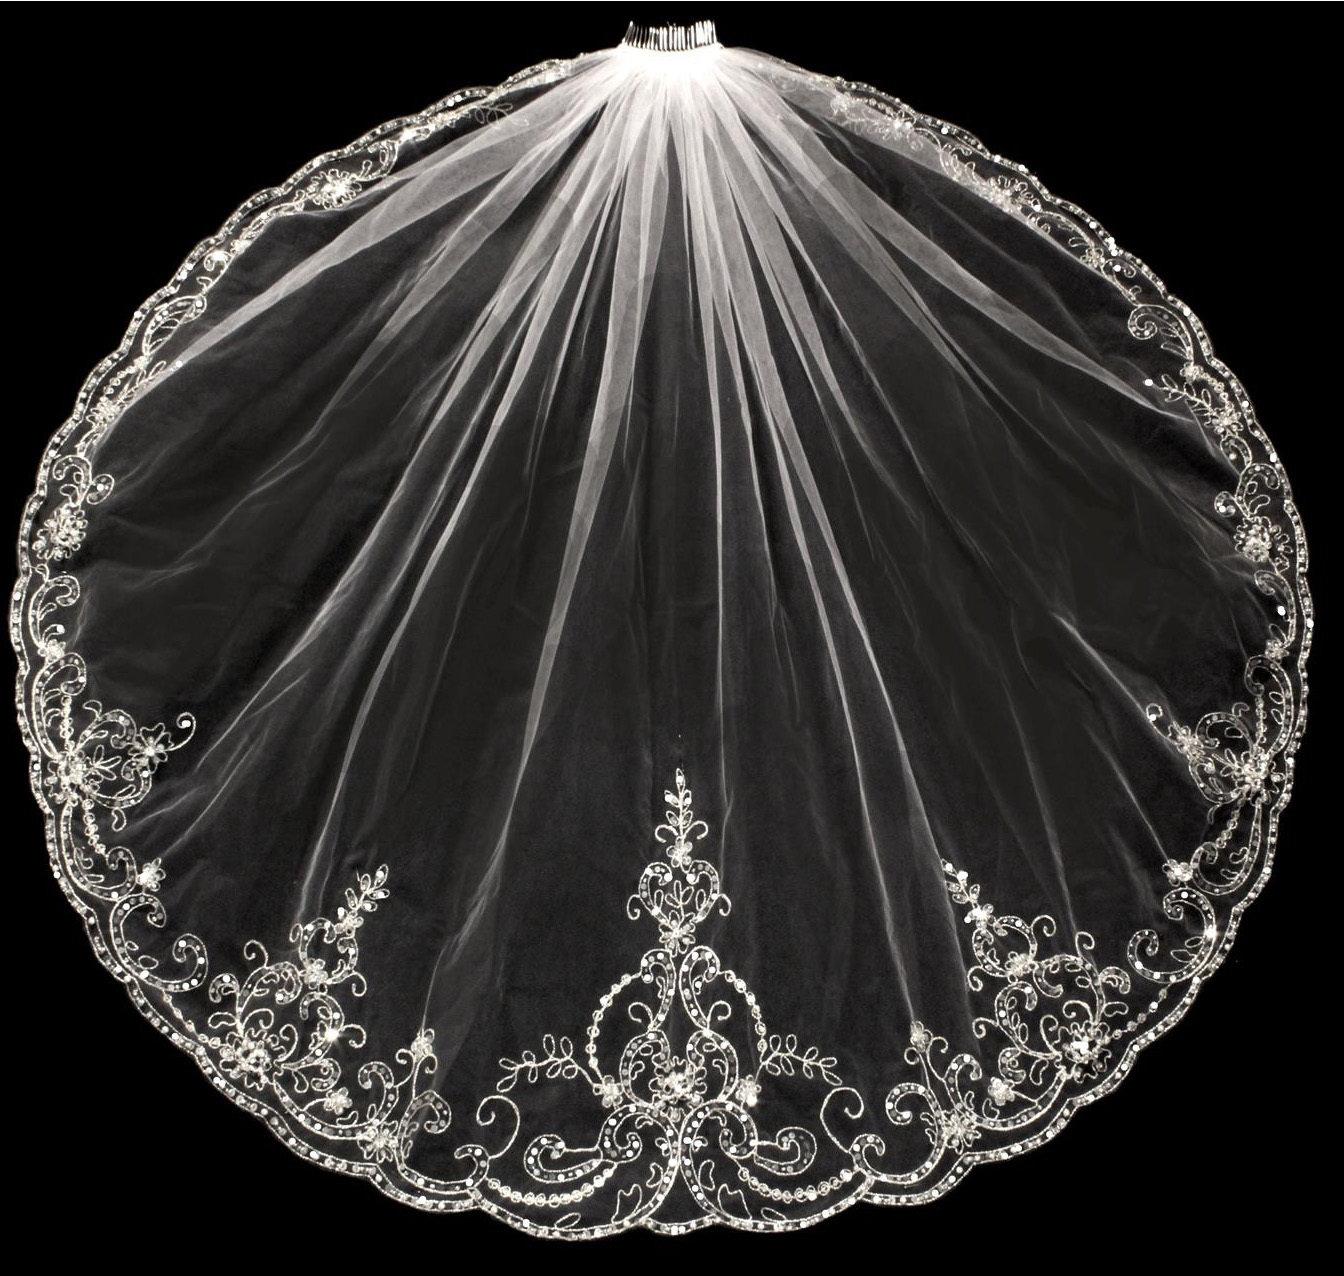 Exquisite Silver Thread Veil